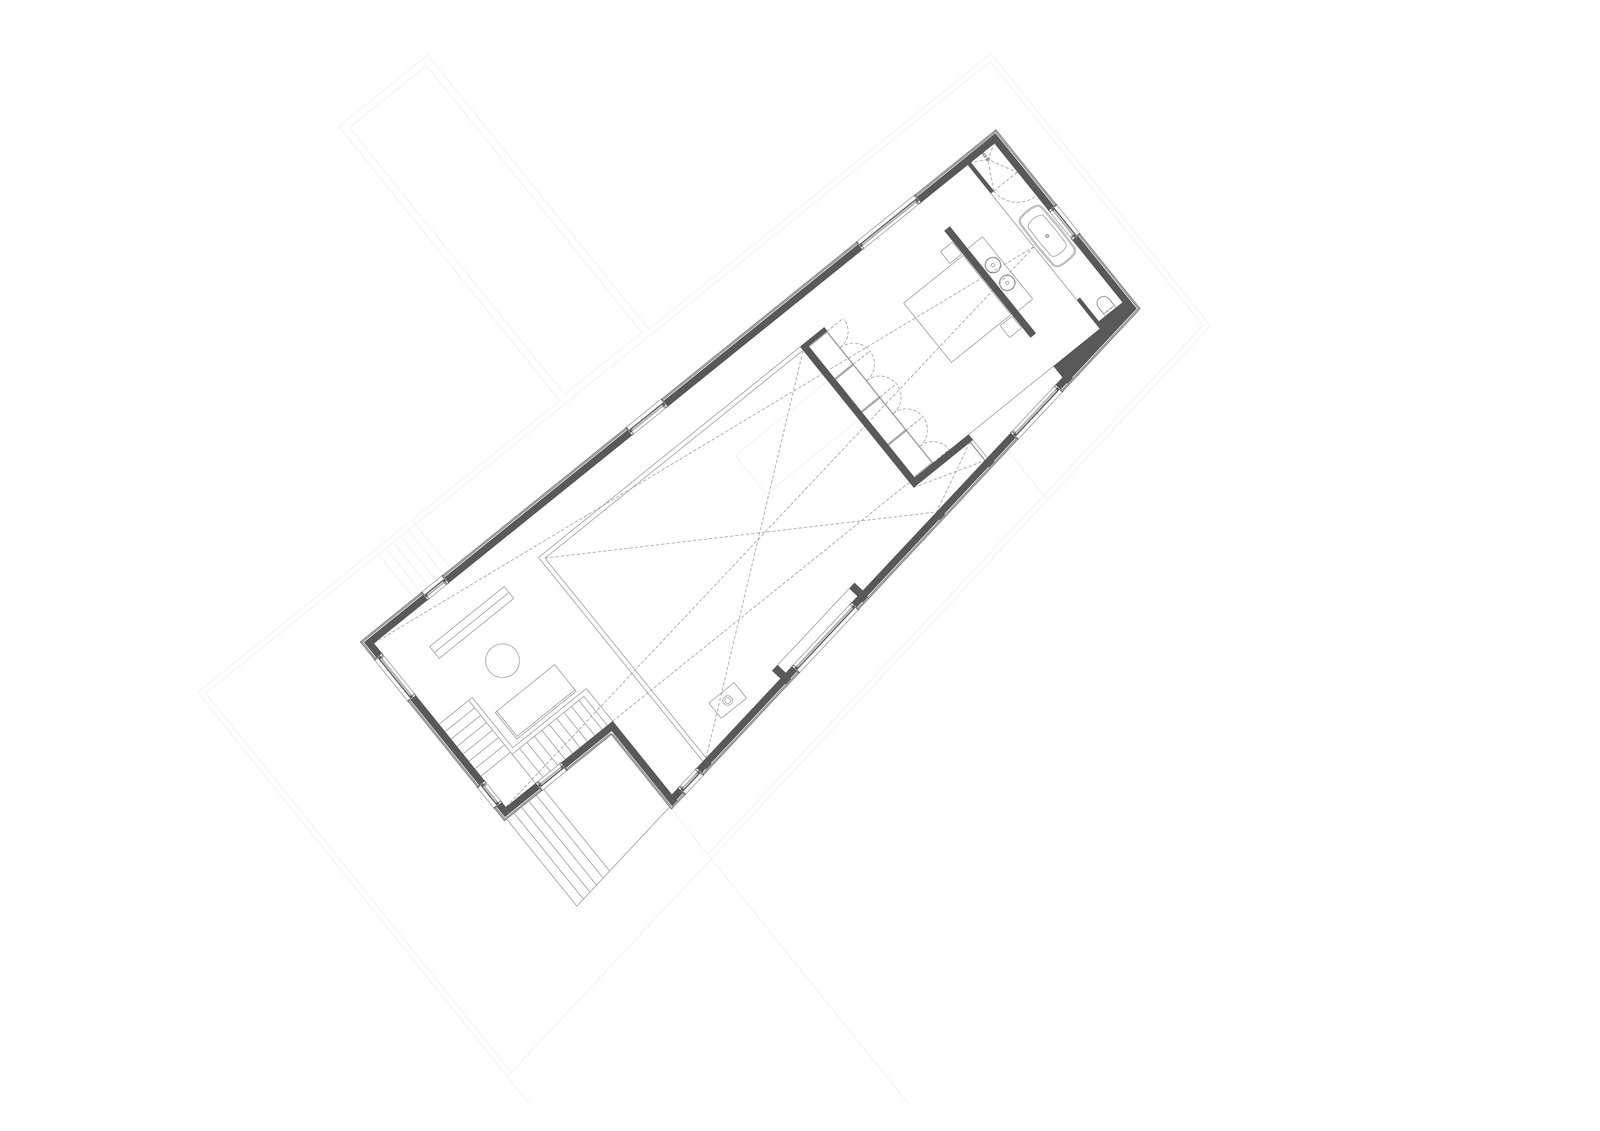 Upper level floor plan drawing.